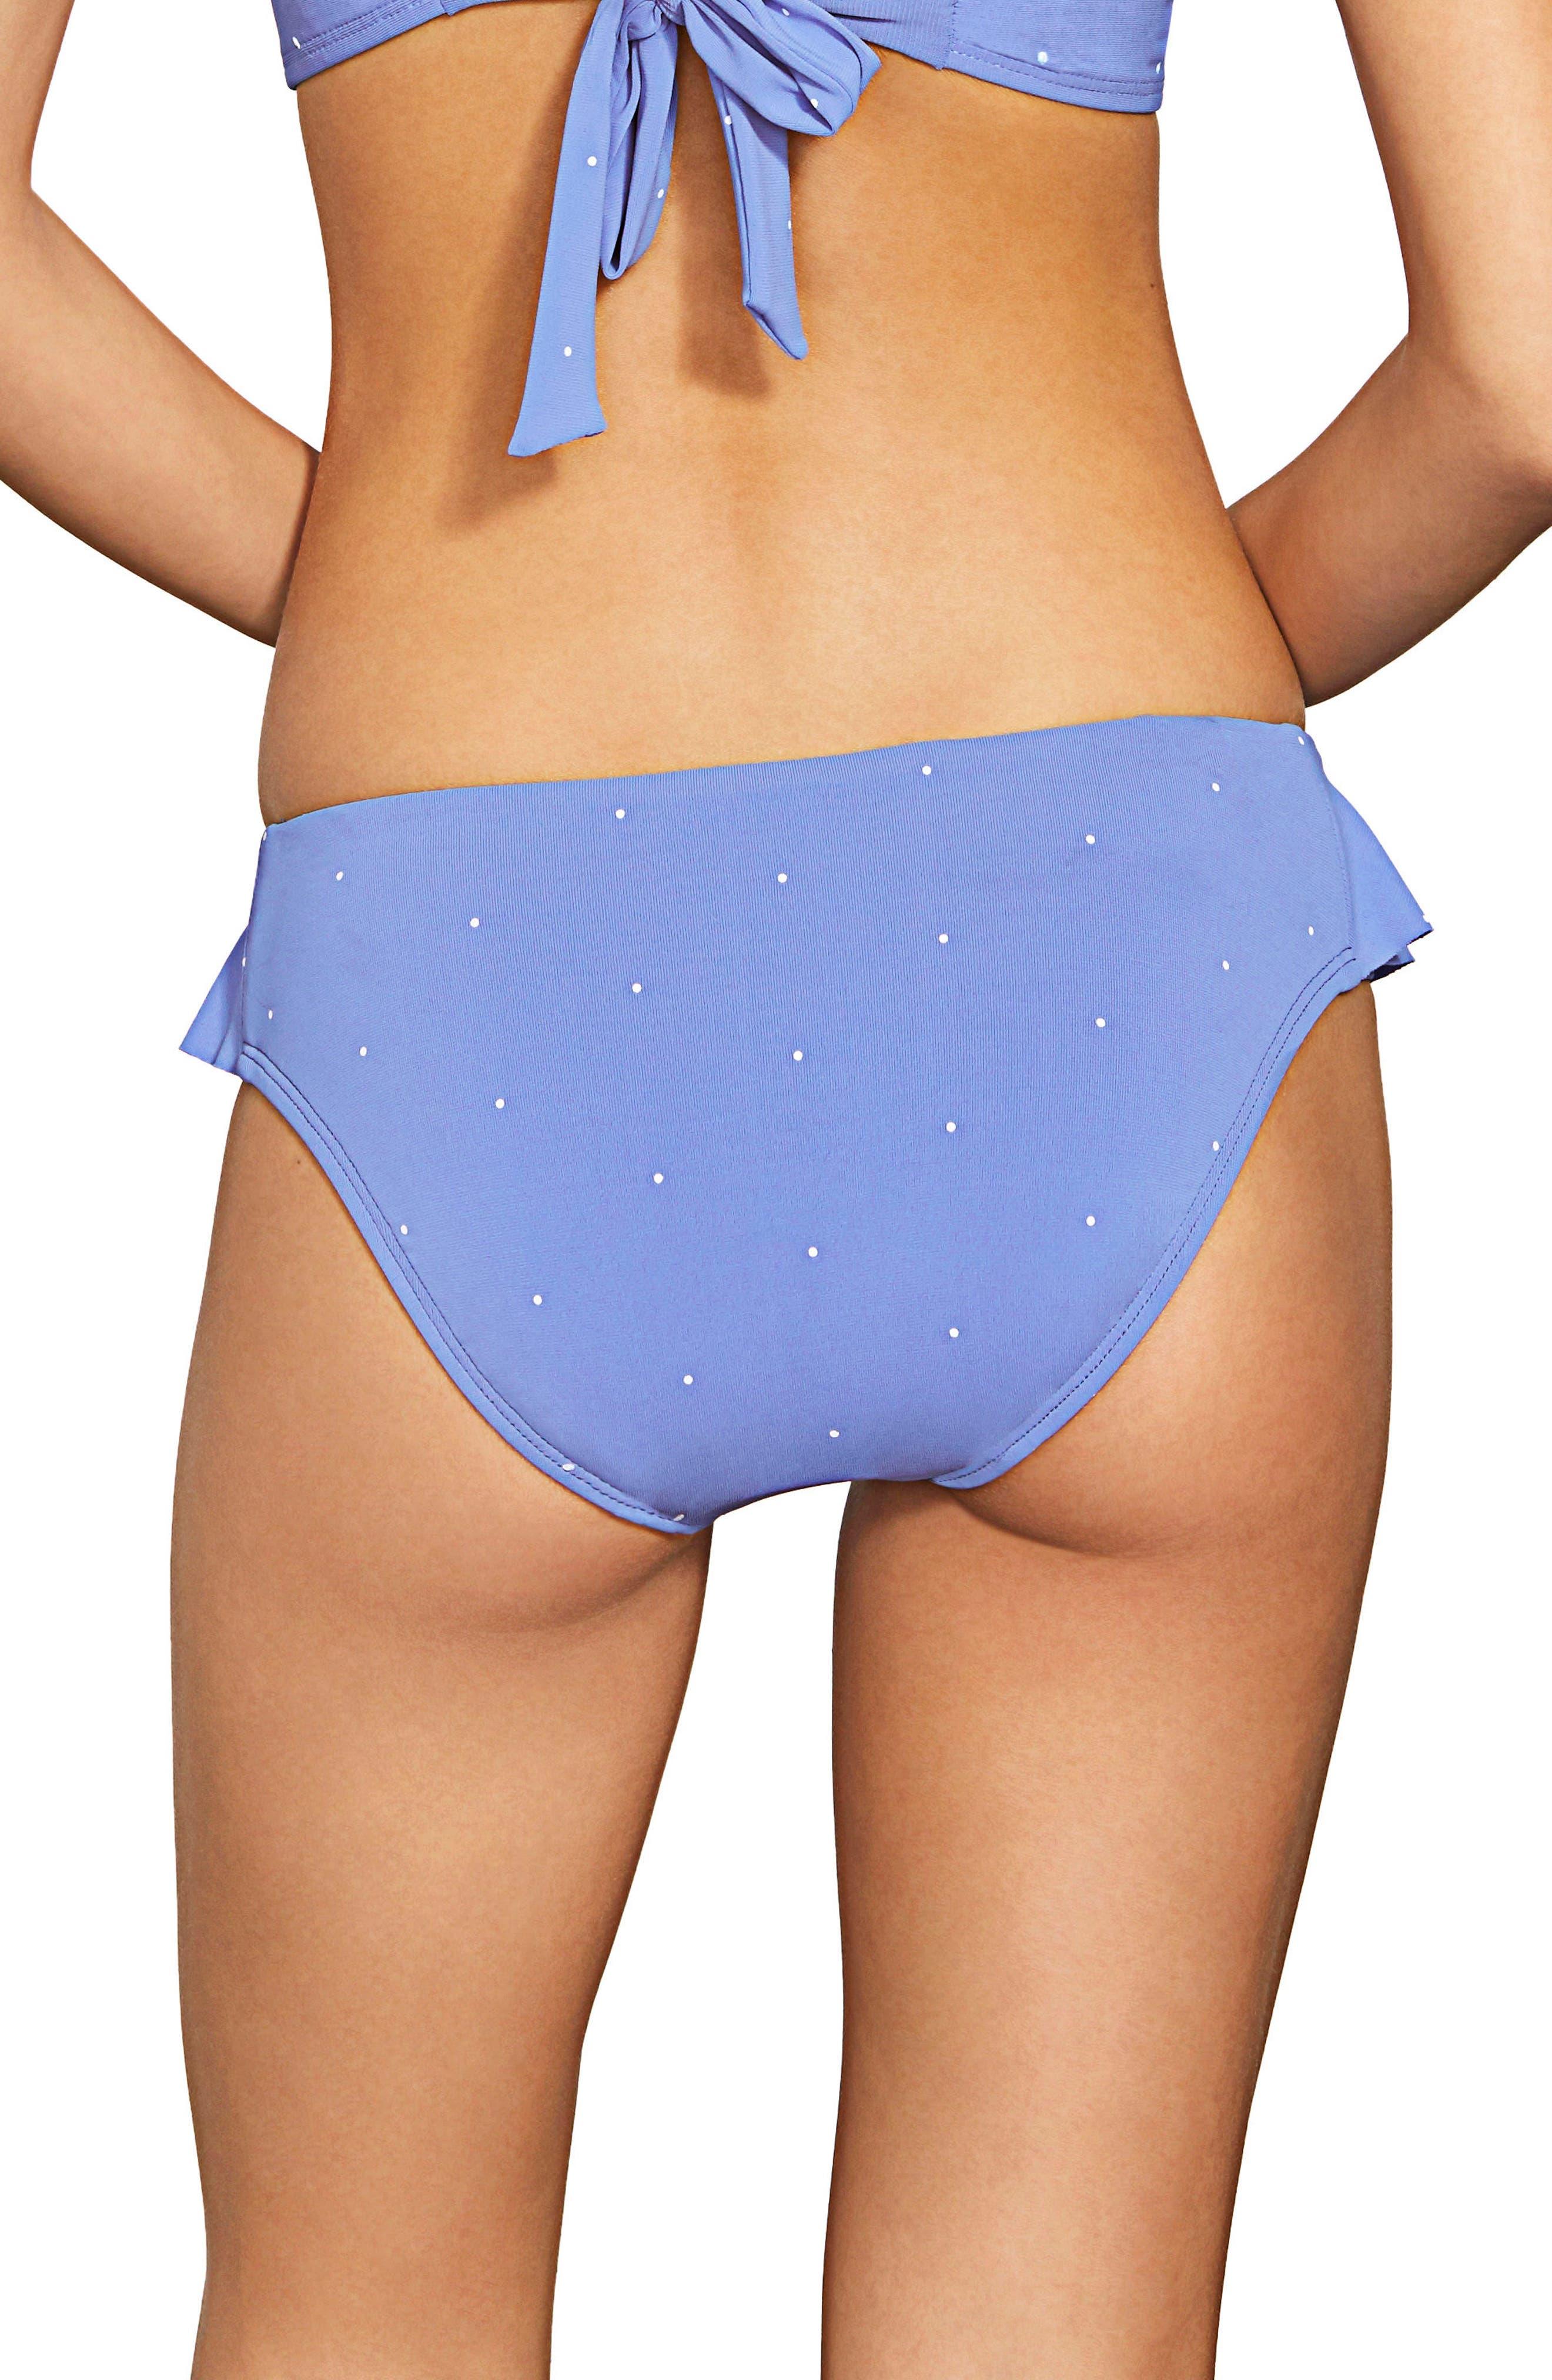 Jennie Ruffle Bikini Bottoms,                             Alternate thumbnail 2, color,                             Periwinkle